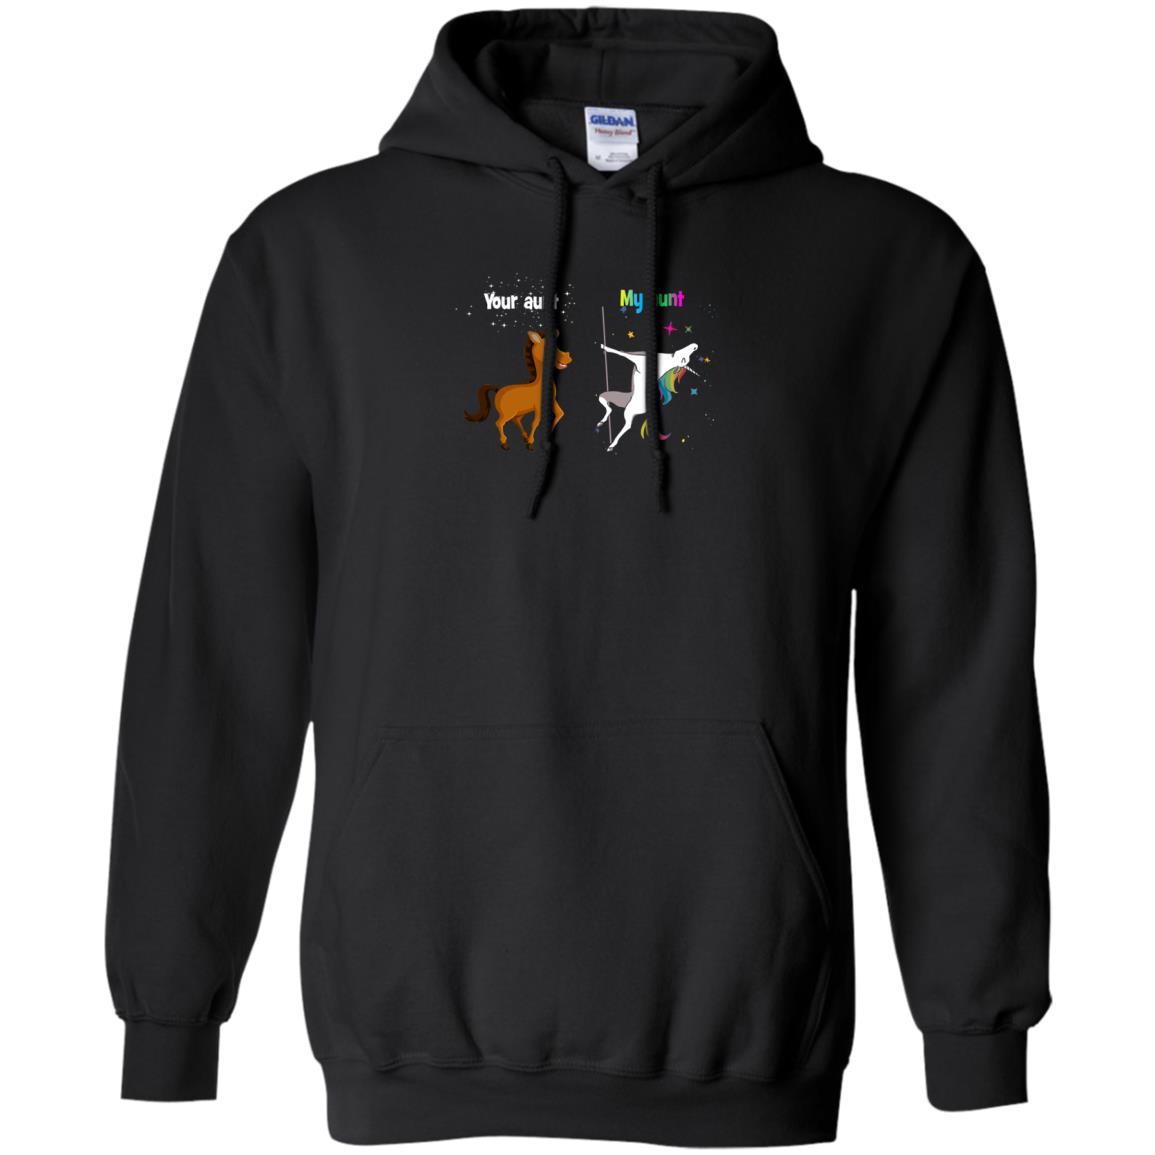 image 939px My aunt unicorn vs your aunt horse t shirt, hoodies, tank top